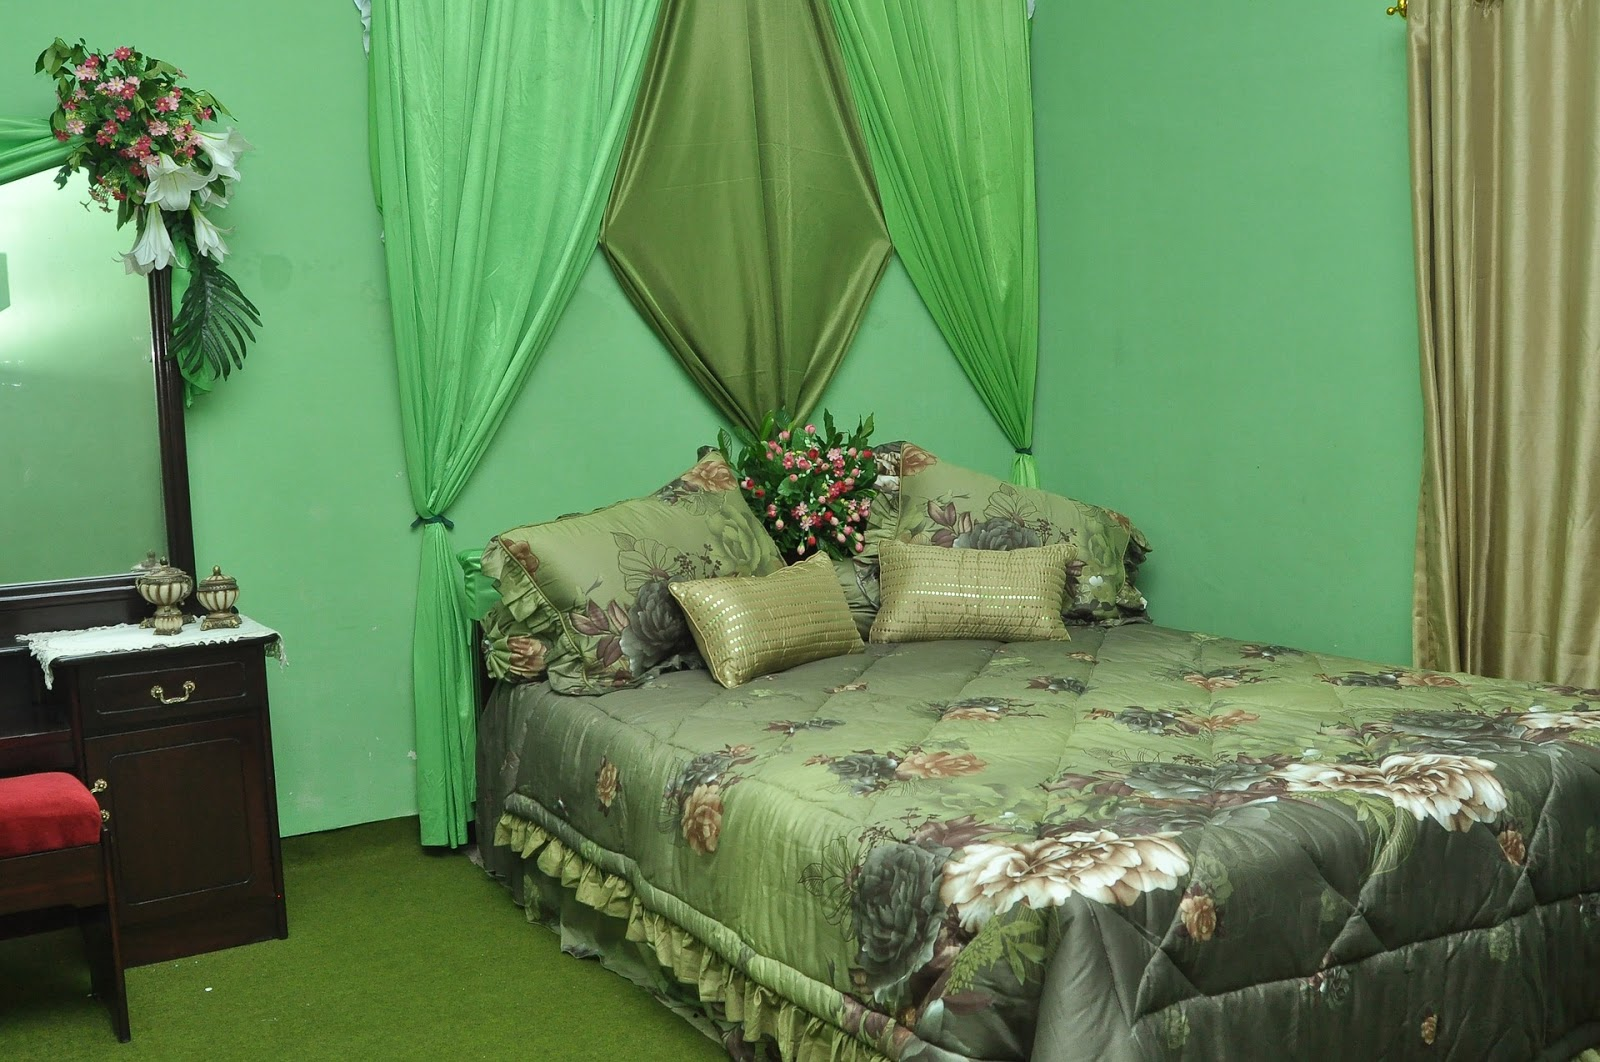 Dekorasi Kamar Tidur Pengantin Romantis Kekinian Saat Ini